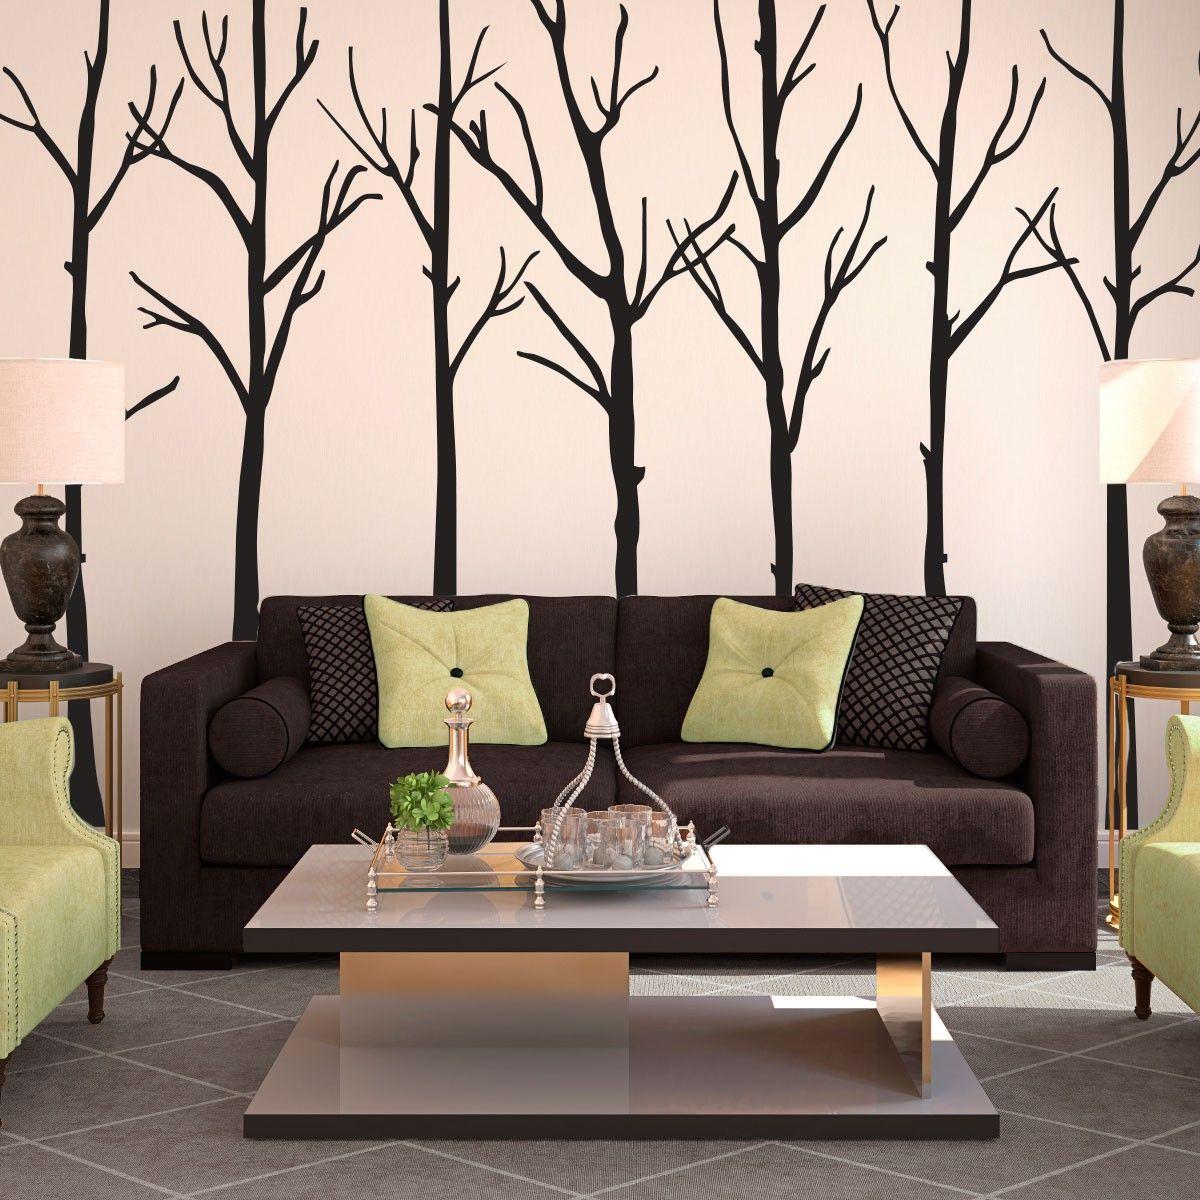 Living room art - 20 methods to make a bare room pop ...